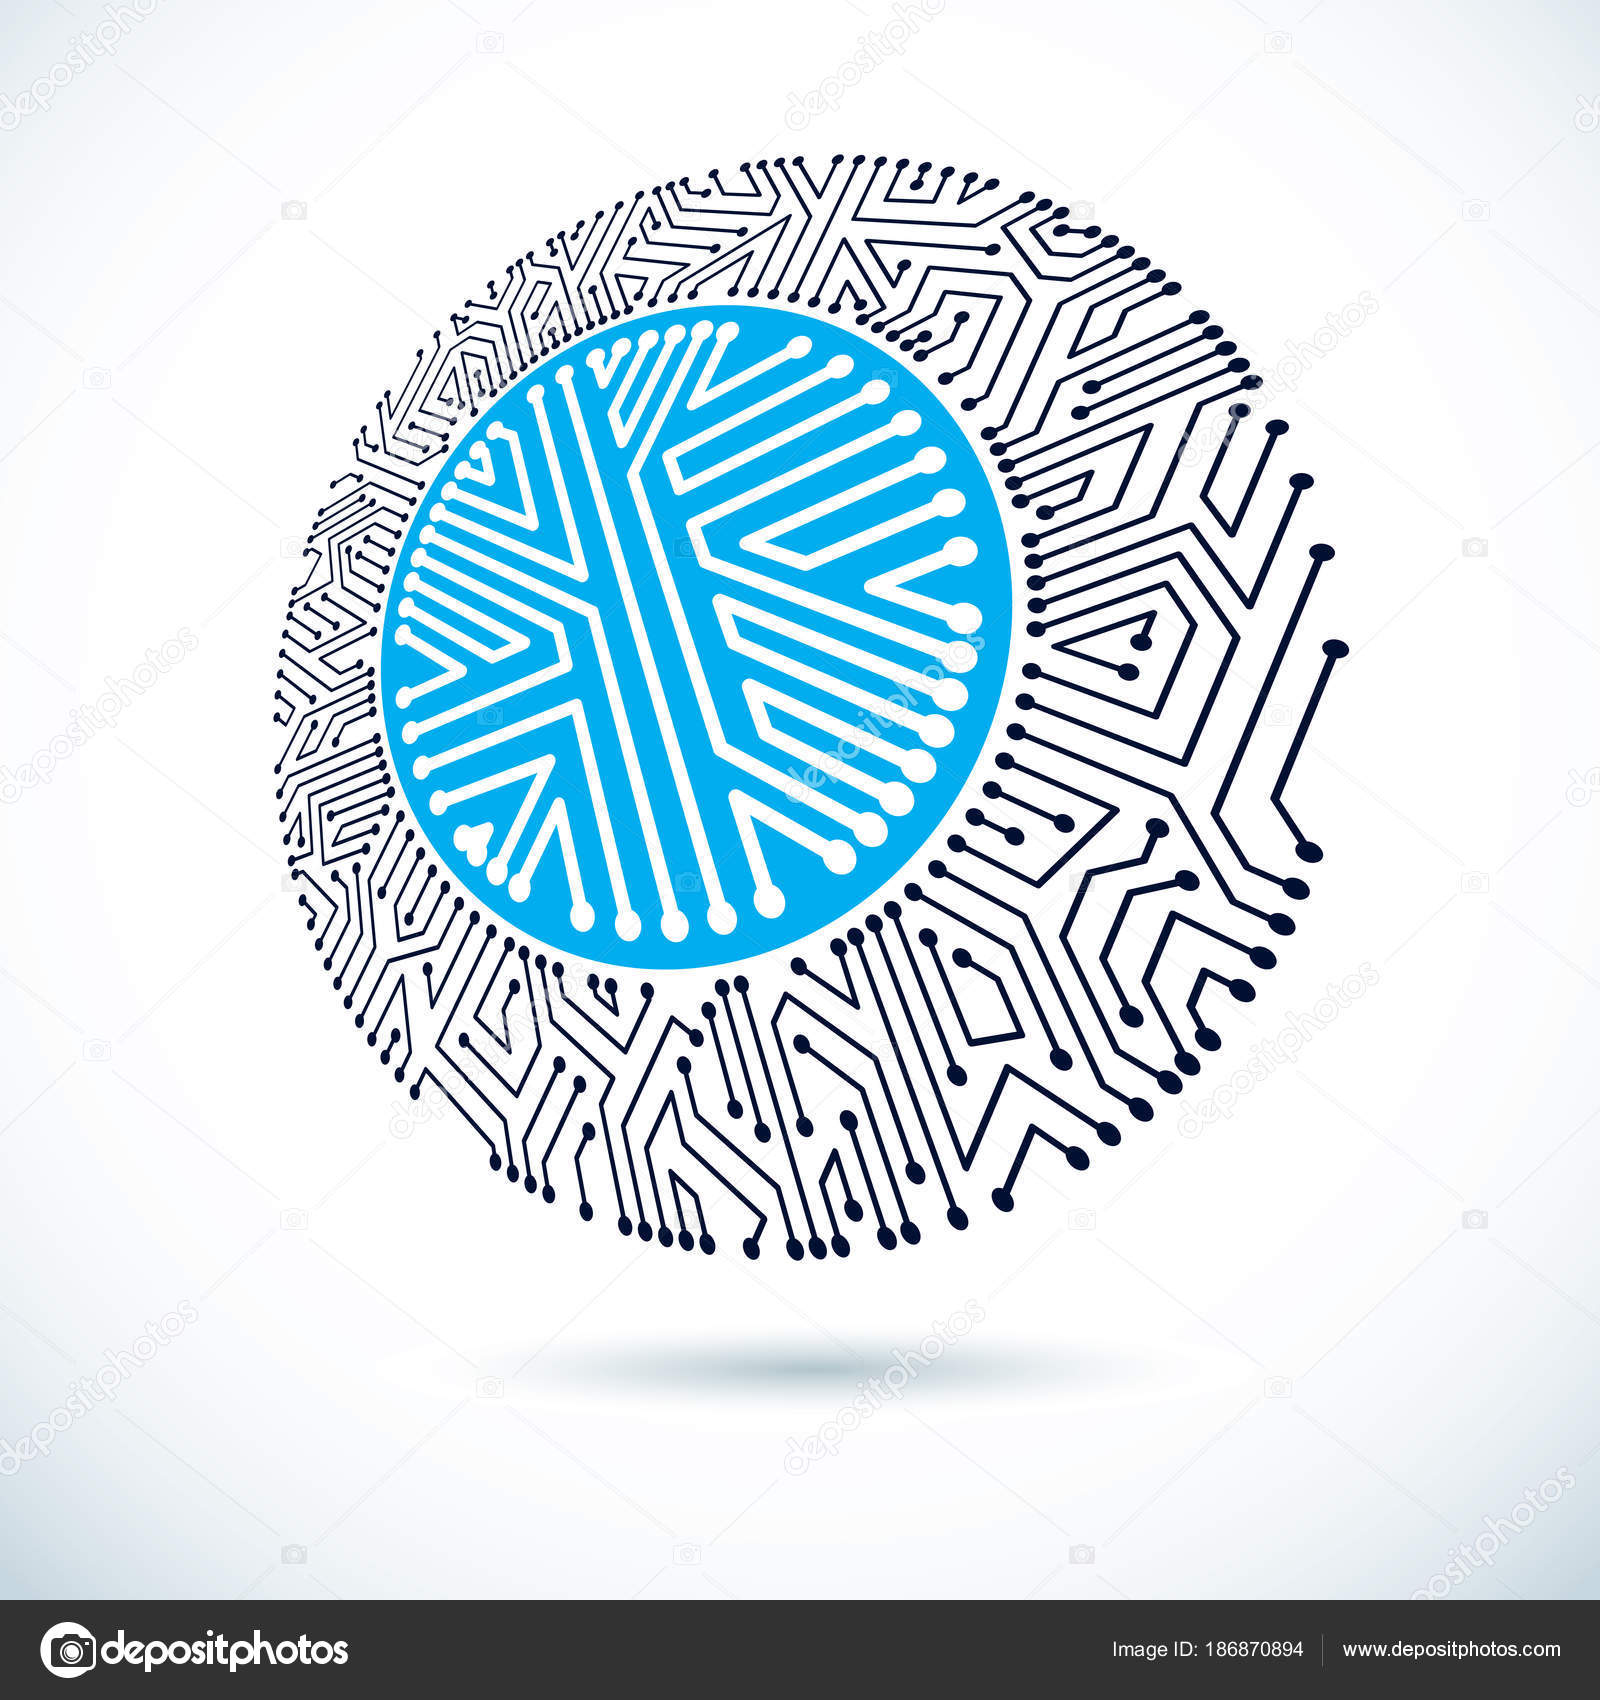 vector abstract technology illustration circular circuit board high